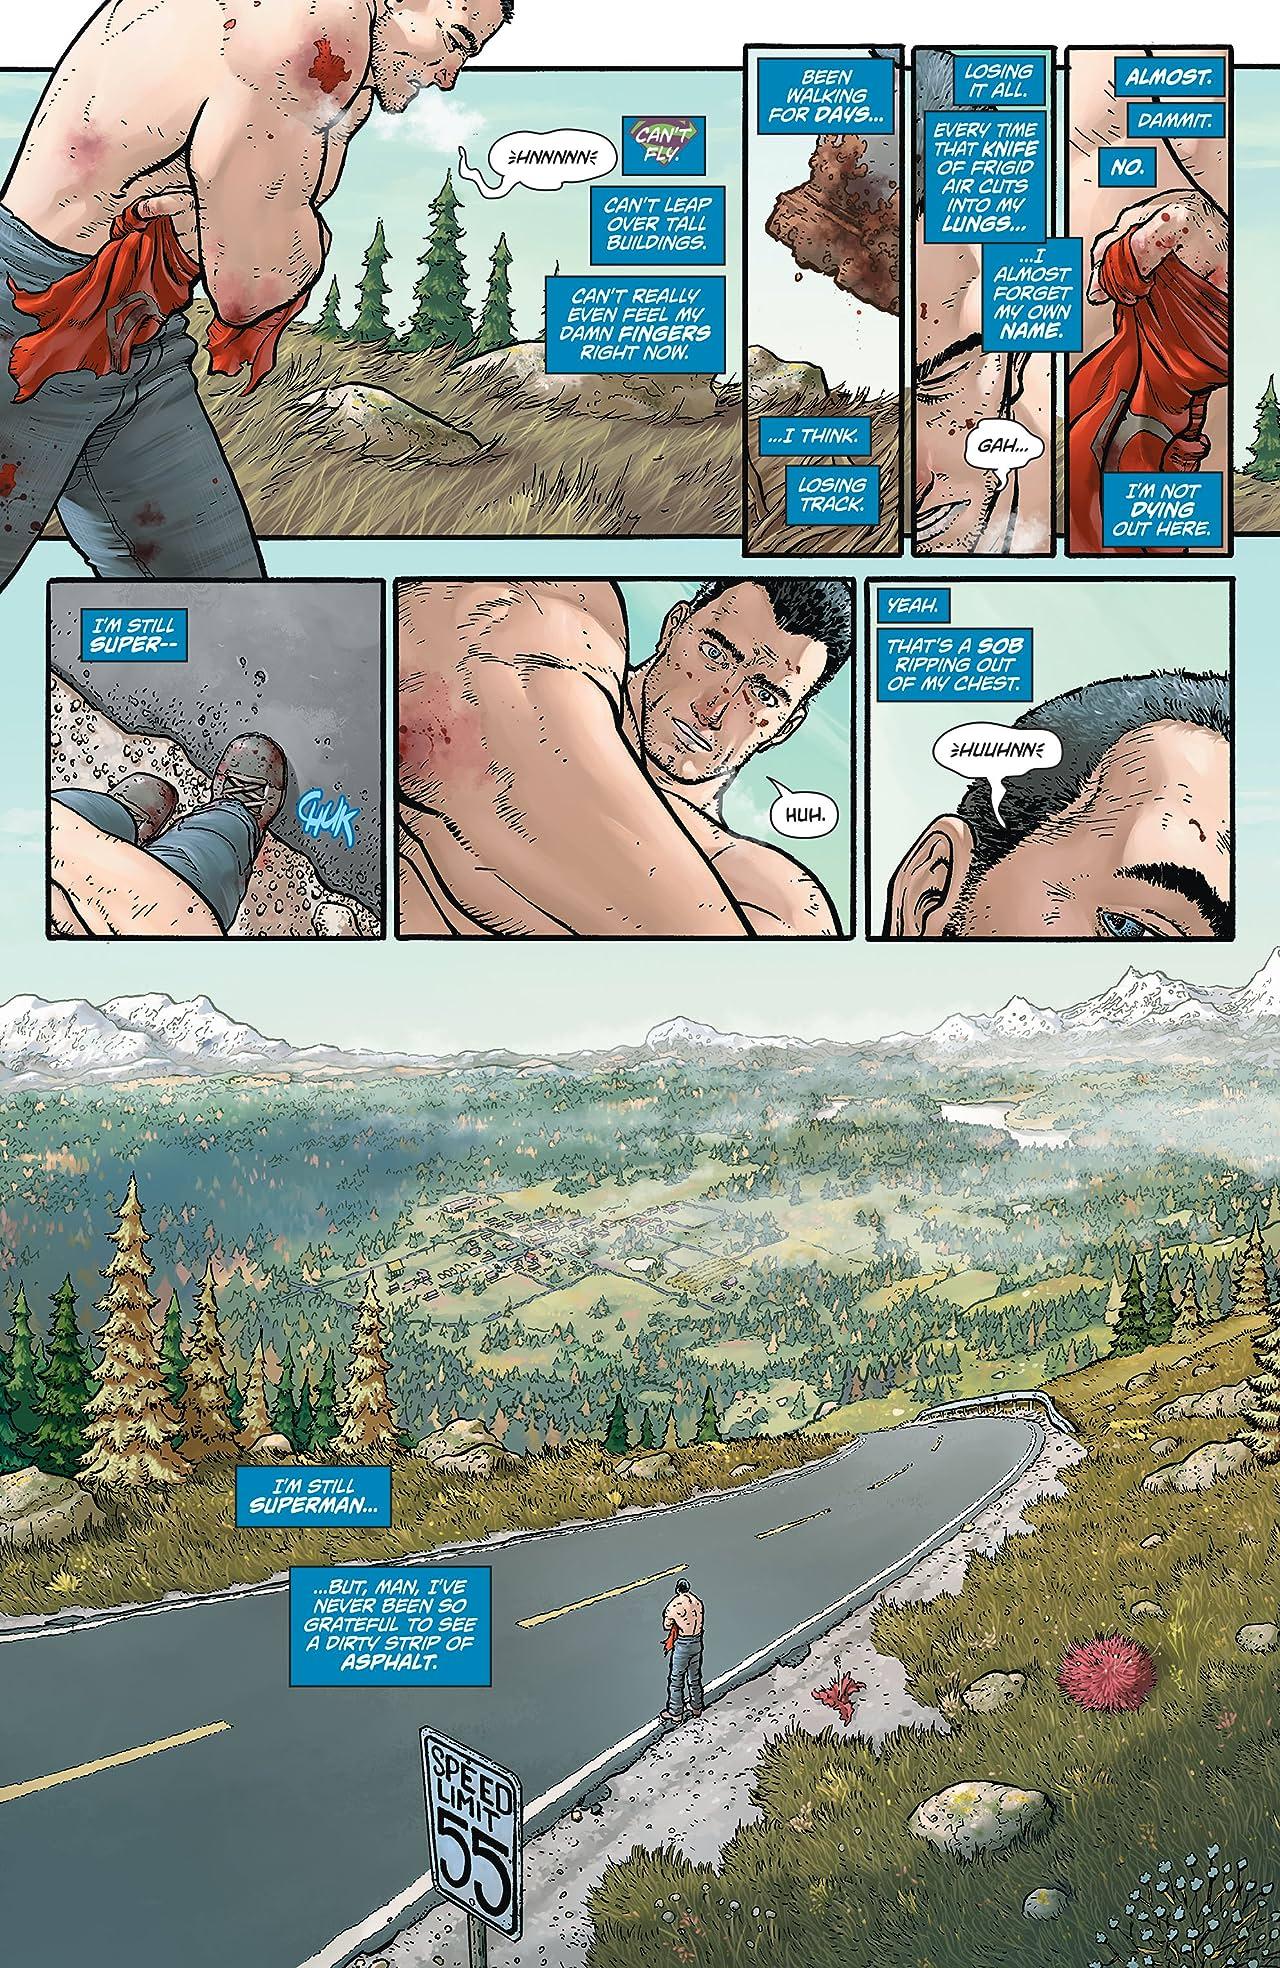 Action Comics (2011-2016) #41